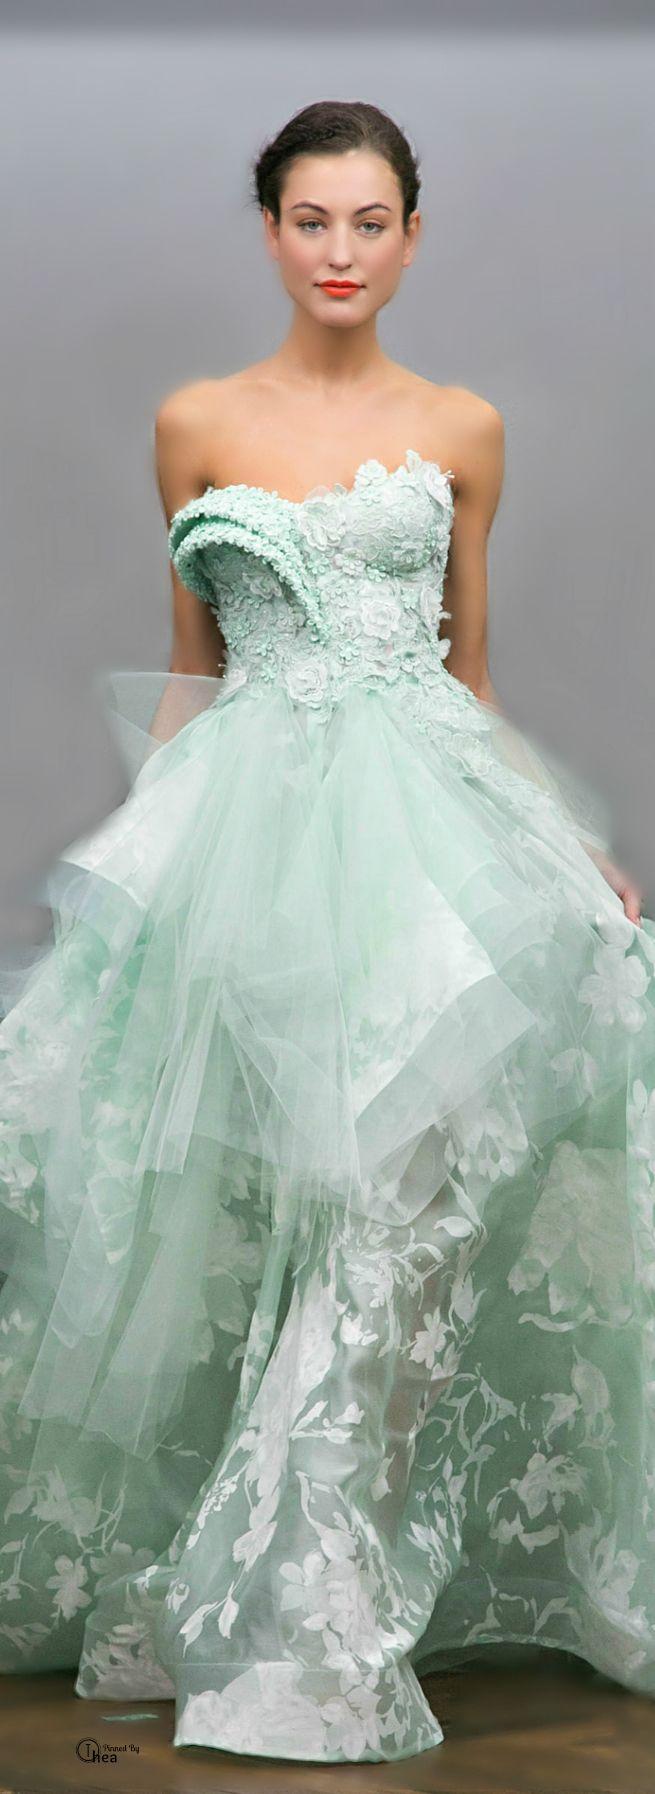 Pin de Divinity Interior Design en What A Dress! | Pinterest ...